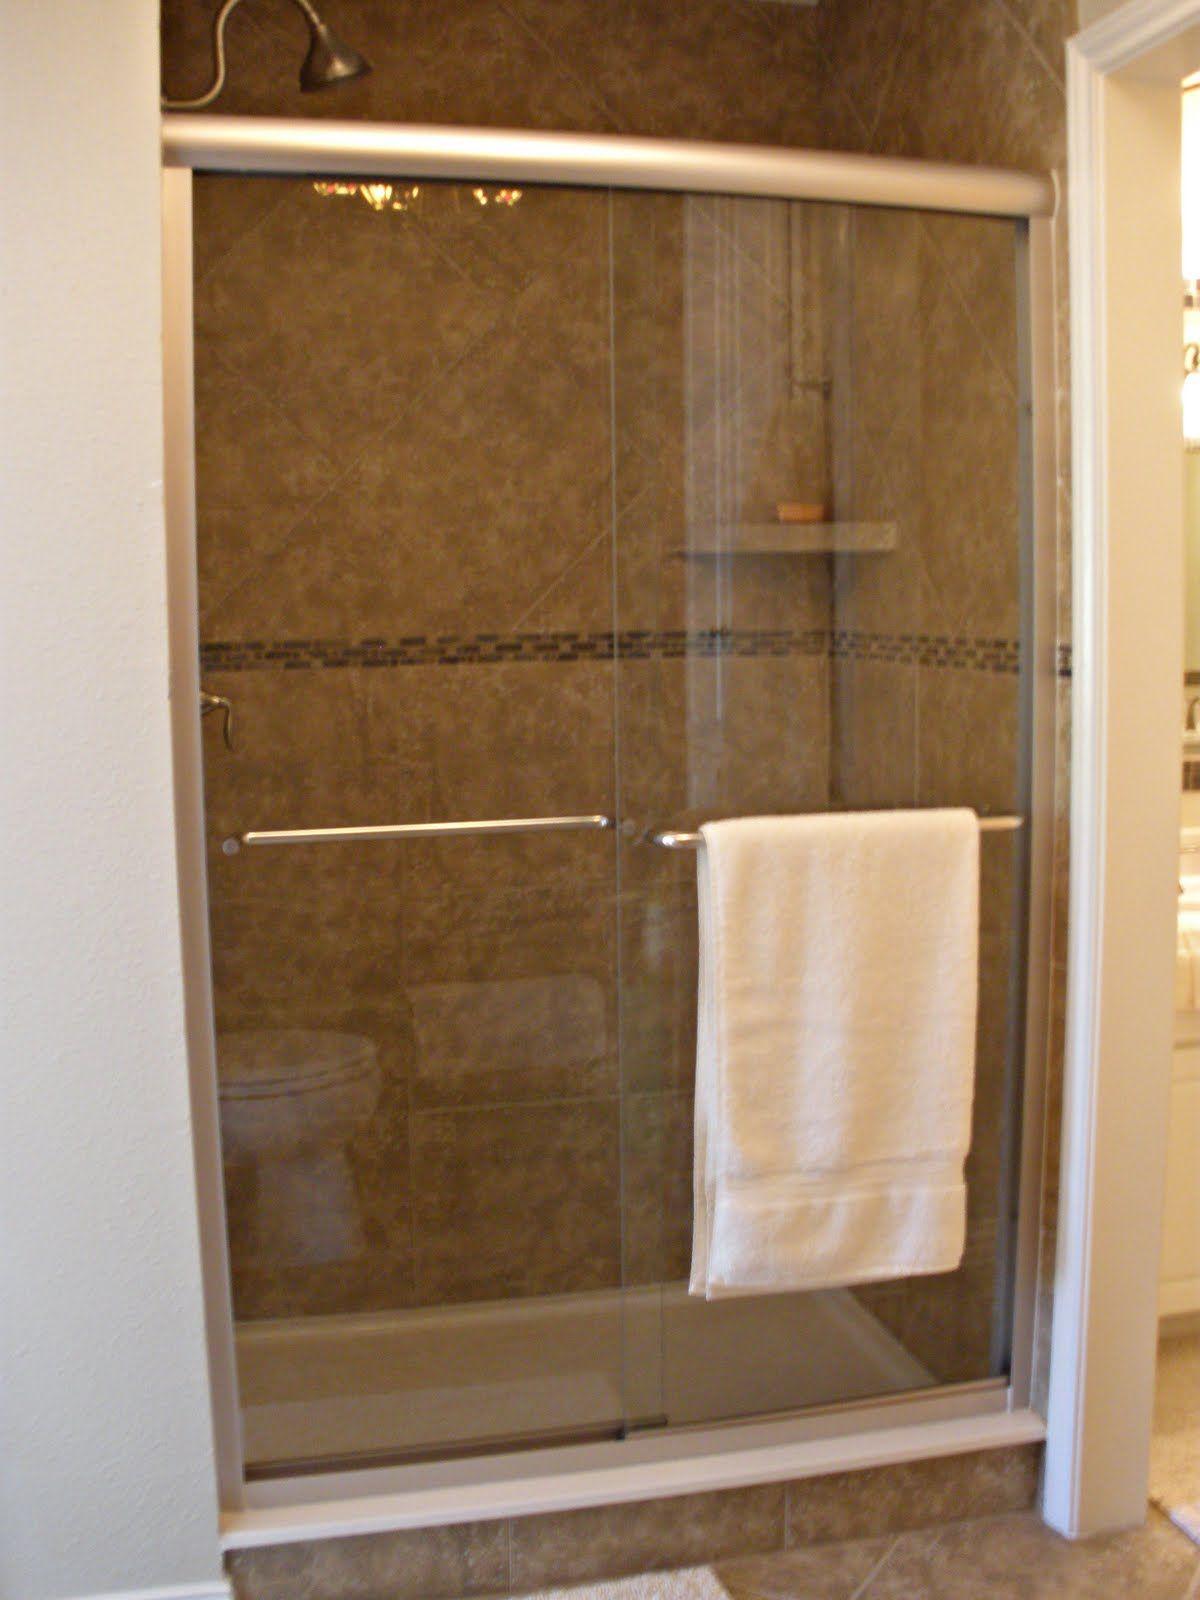 Small Bathroom Designs No Tub master bathroom redo with tile shower and tub surround